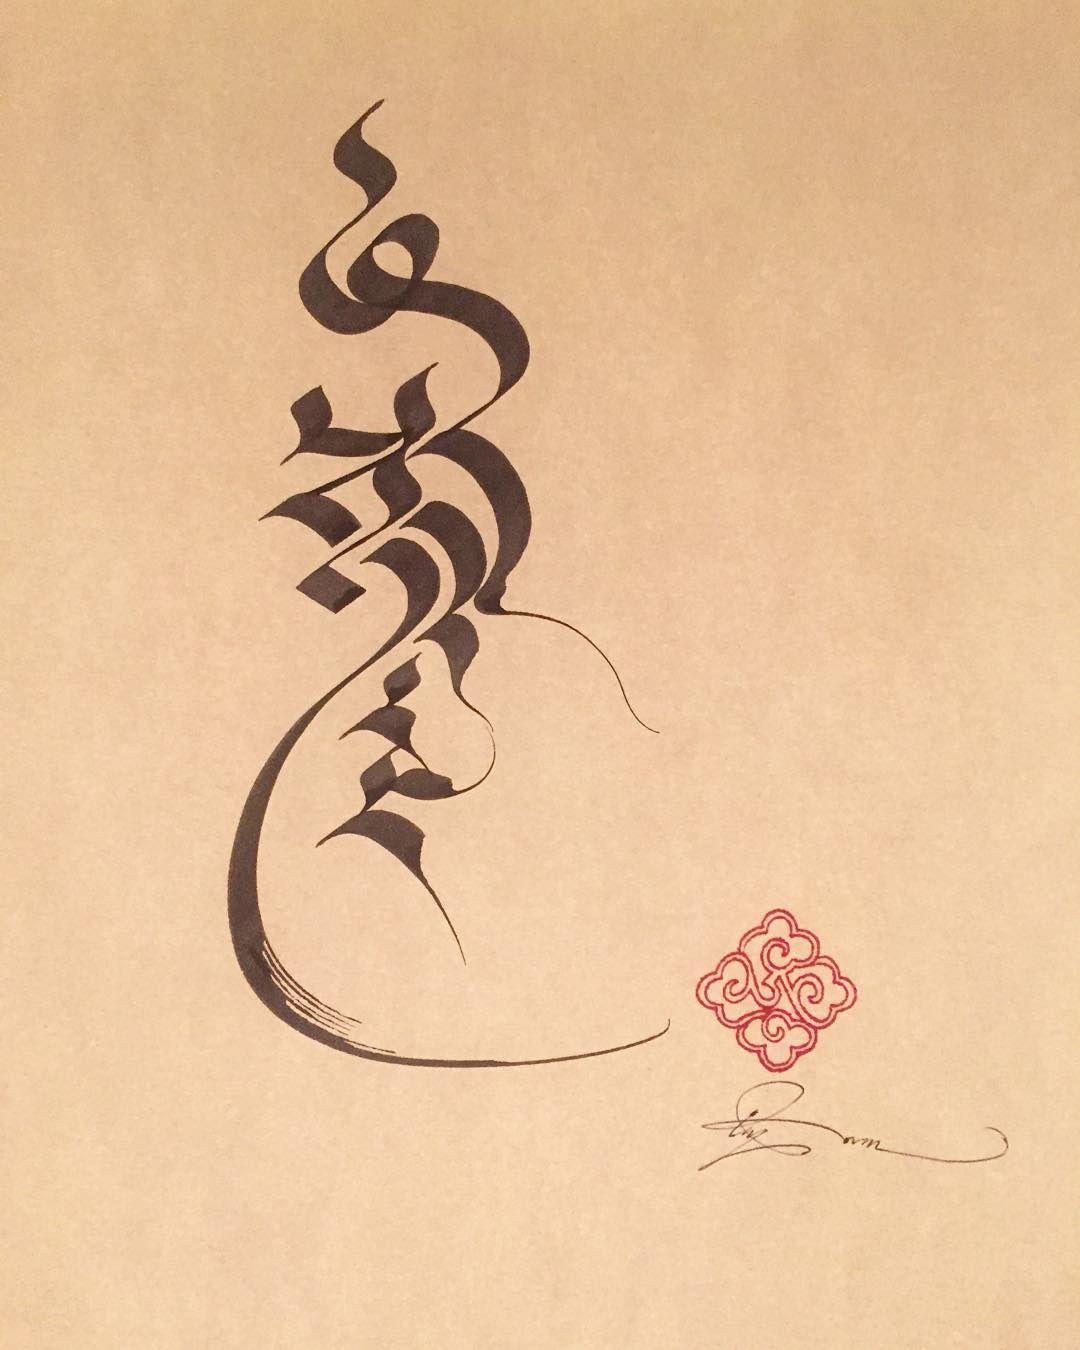 སྙིང་རྗེ། compassion. #Tibetan #tibetanscript ...